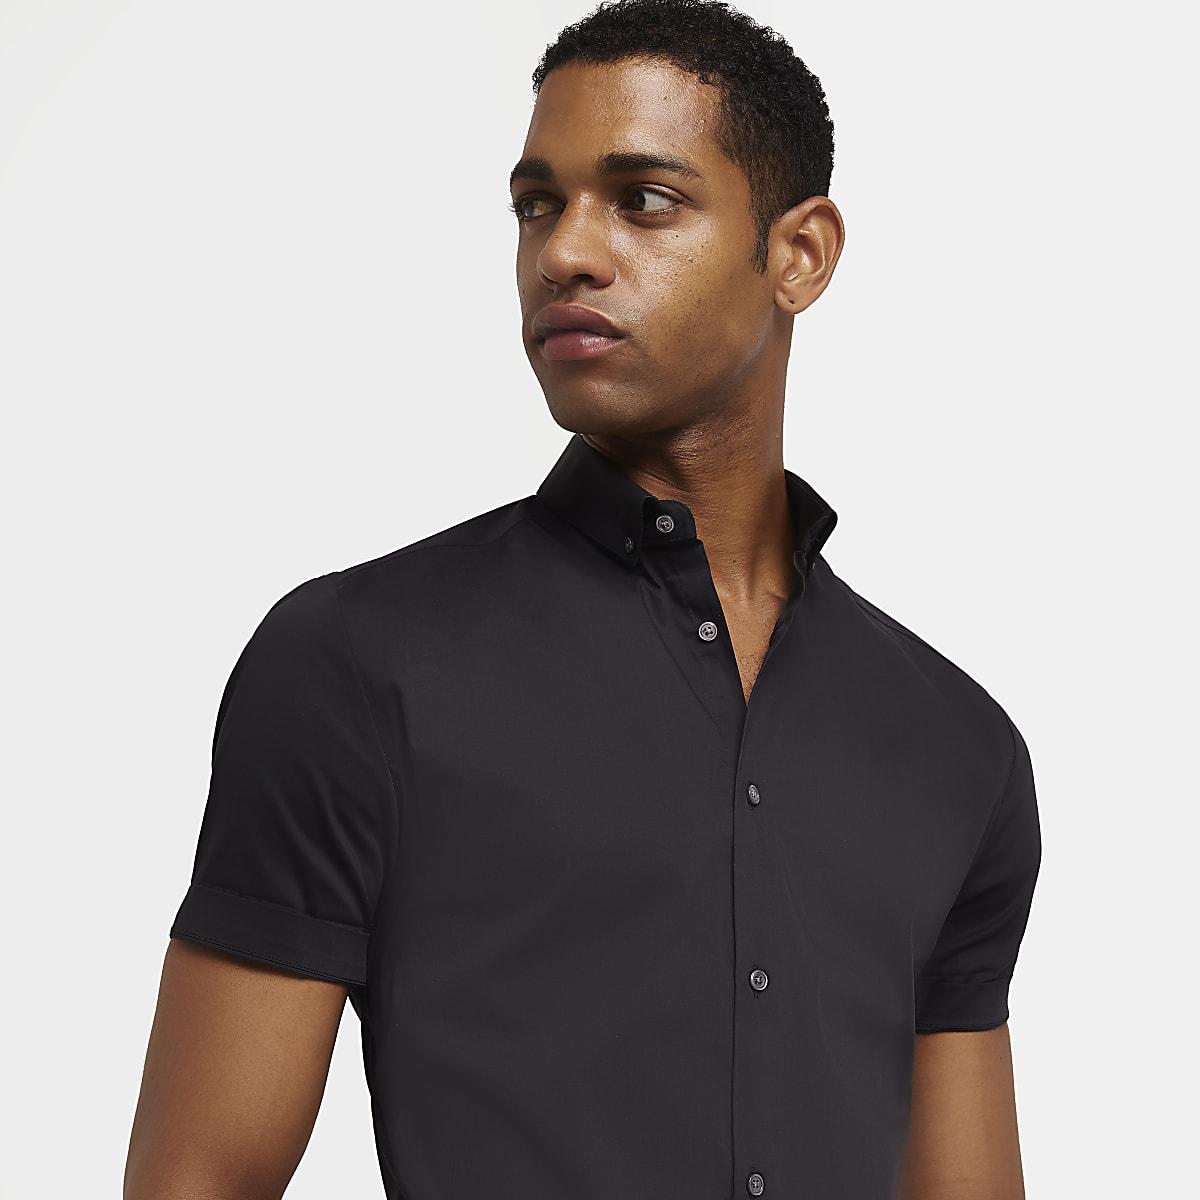 afa850822 Black muscle fit short sleeve shirt - Short Sleeve Shirts - Shirts - men